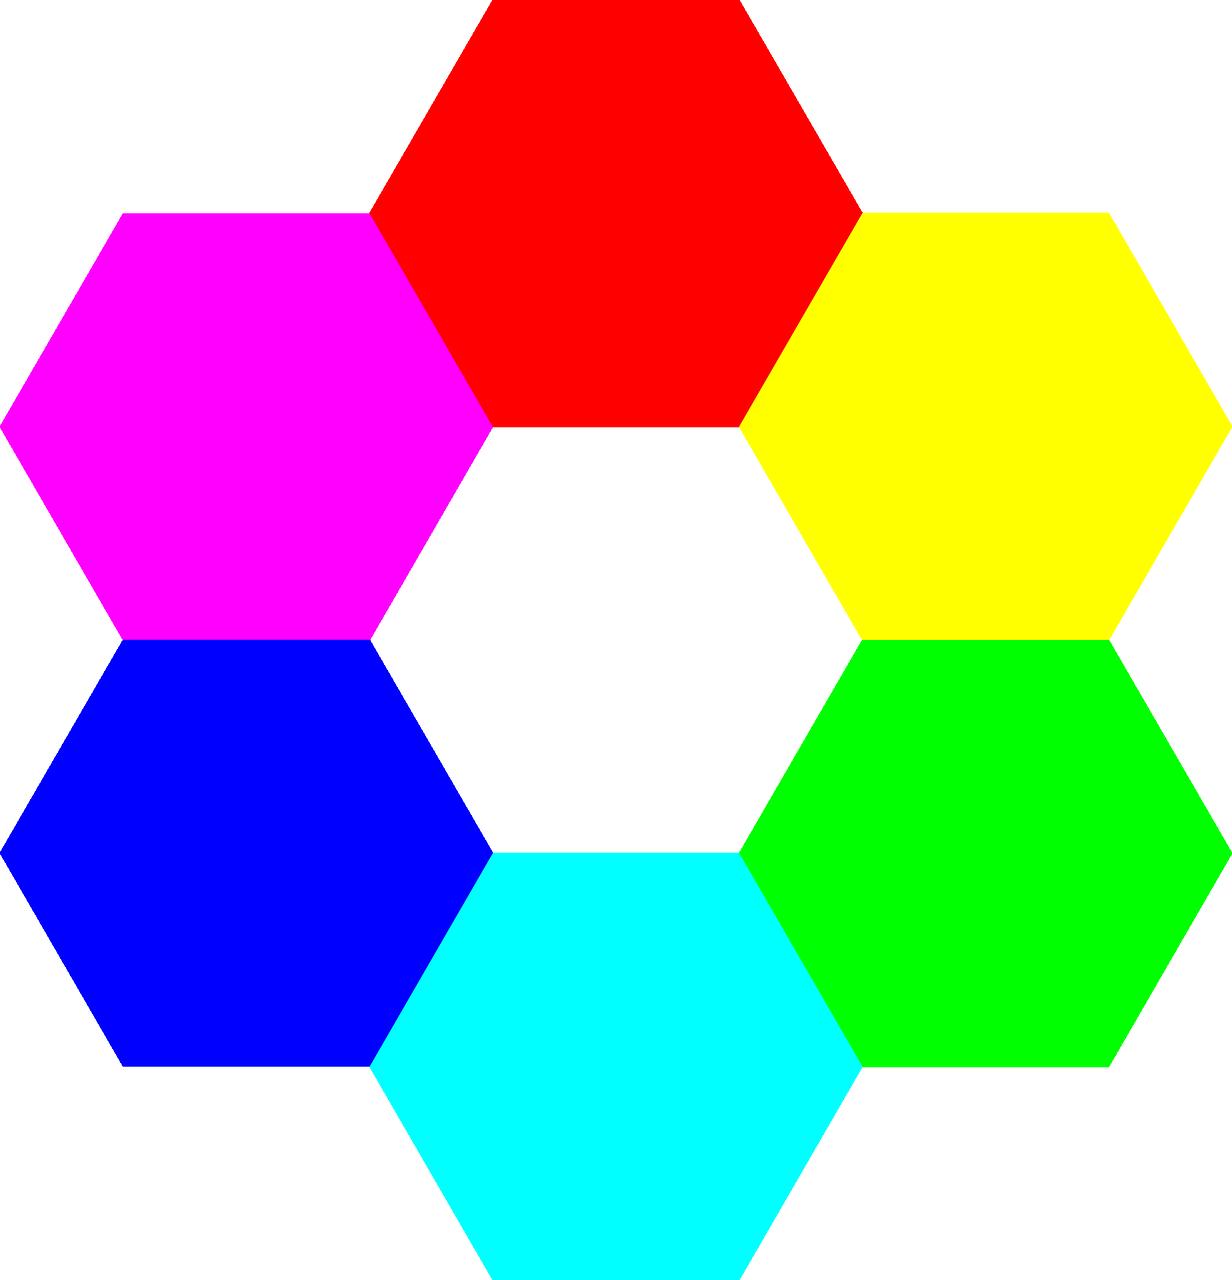 Colors Hexagon Symmetry Rainbow Colors Free Vector Graphics Free Image From Needpix Com